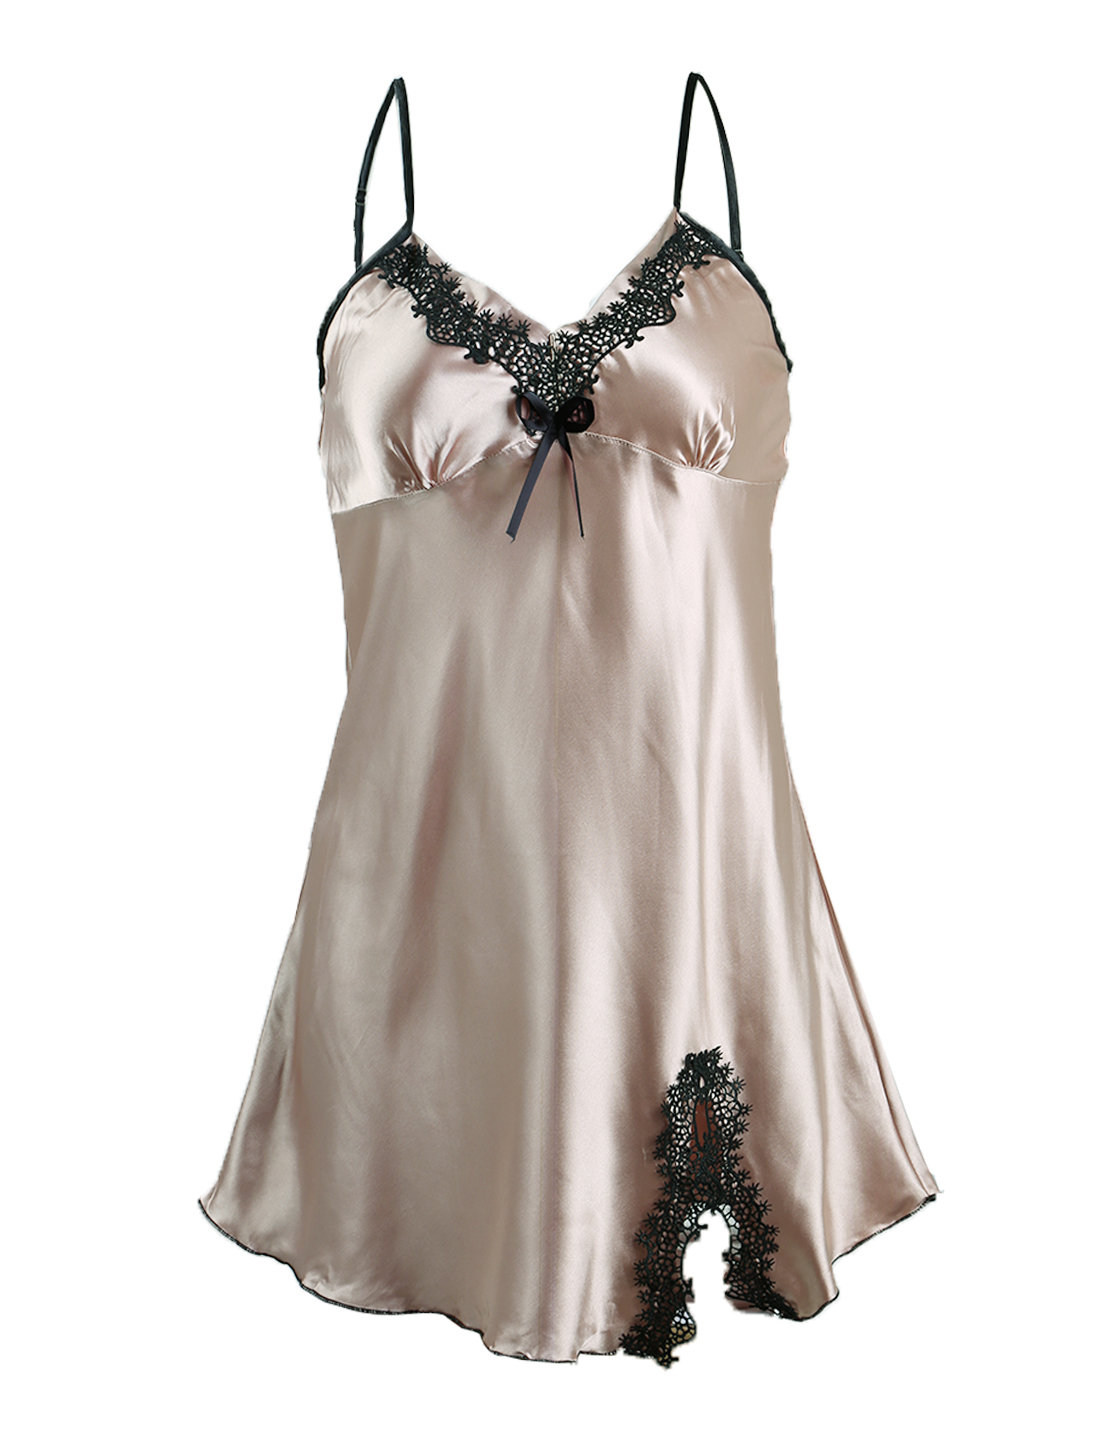 Women Satin Lace Trim Sleepwear Nightgown Pajama Slip Dress Champagne-Floral XL